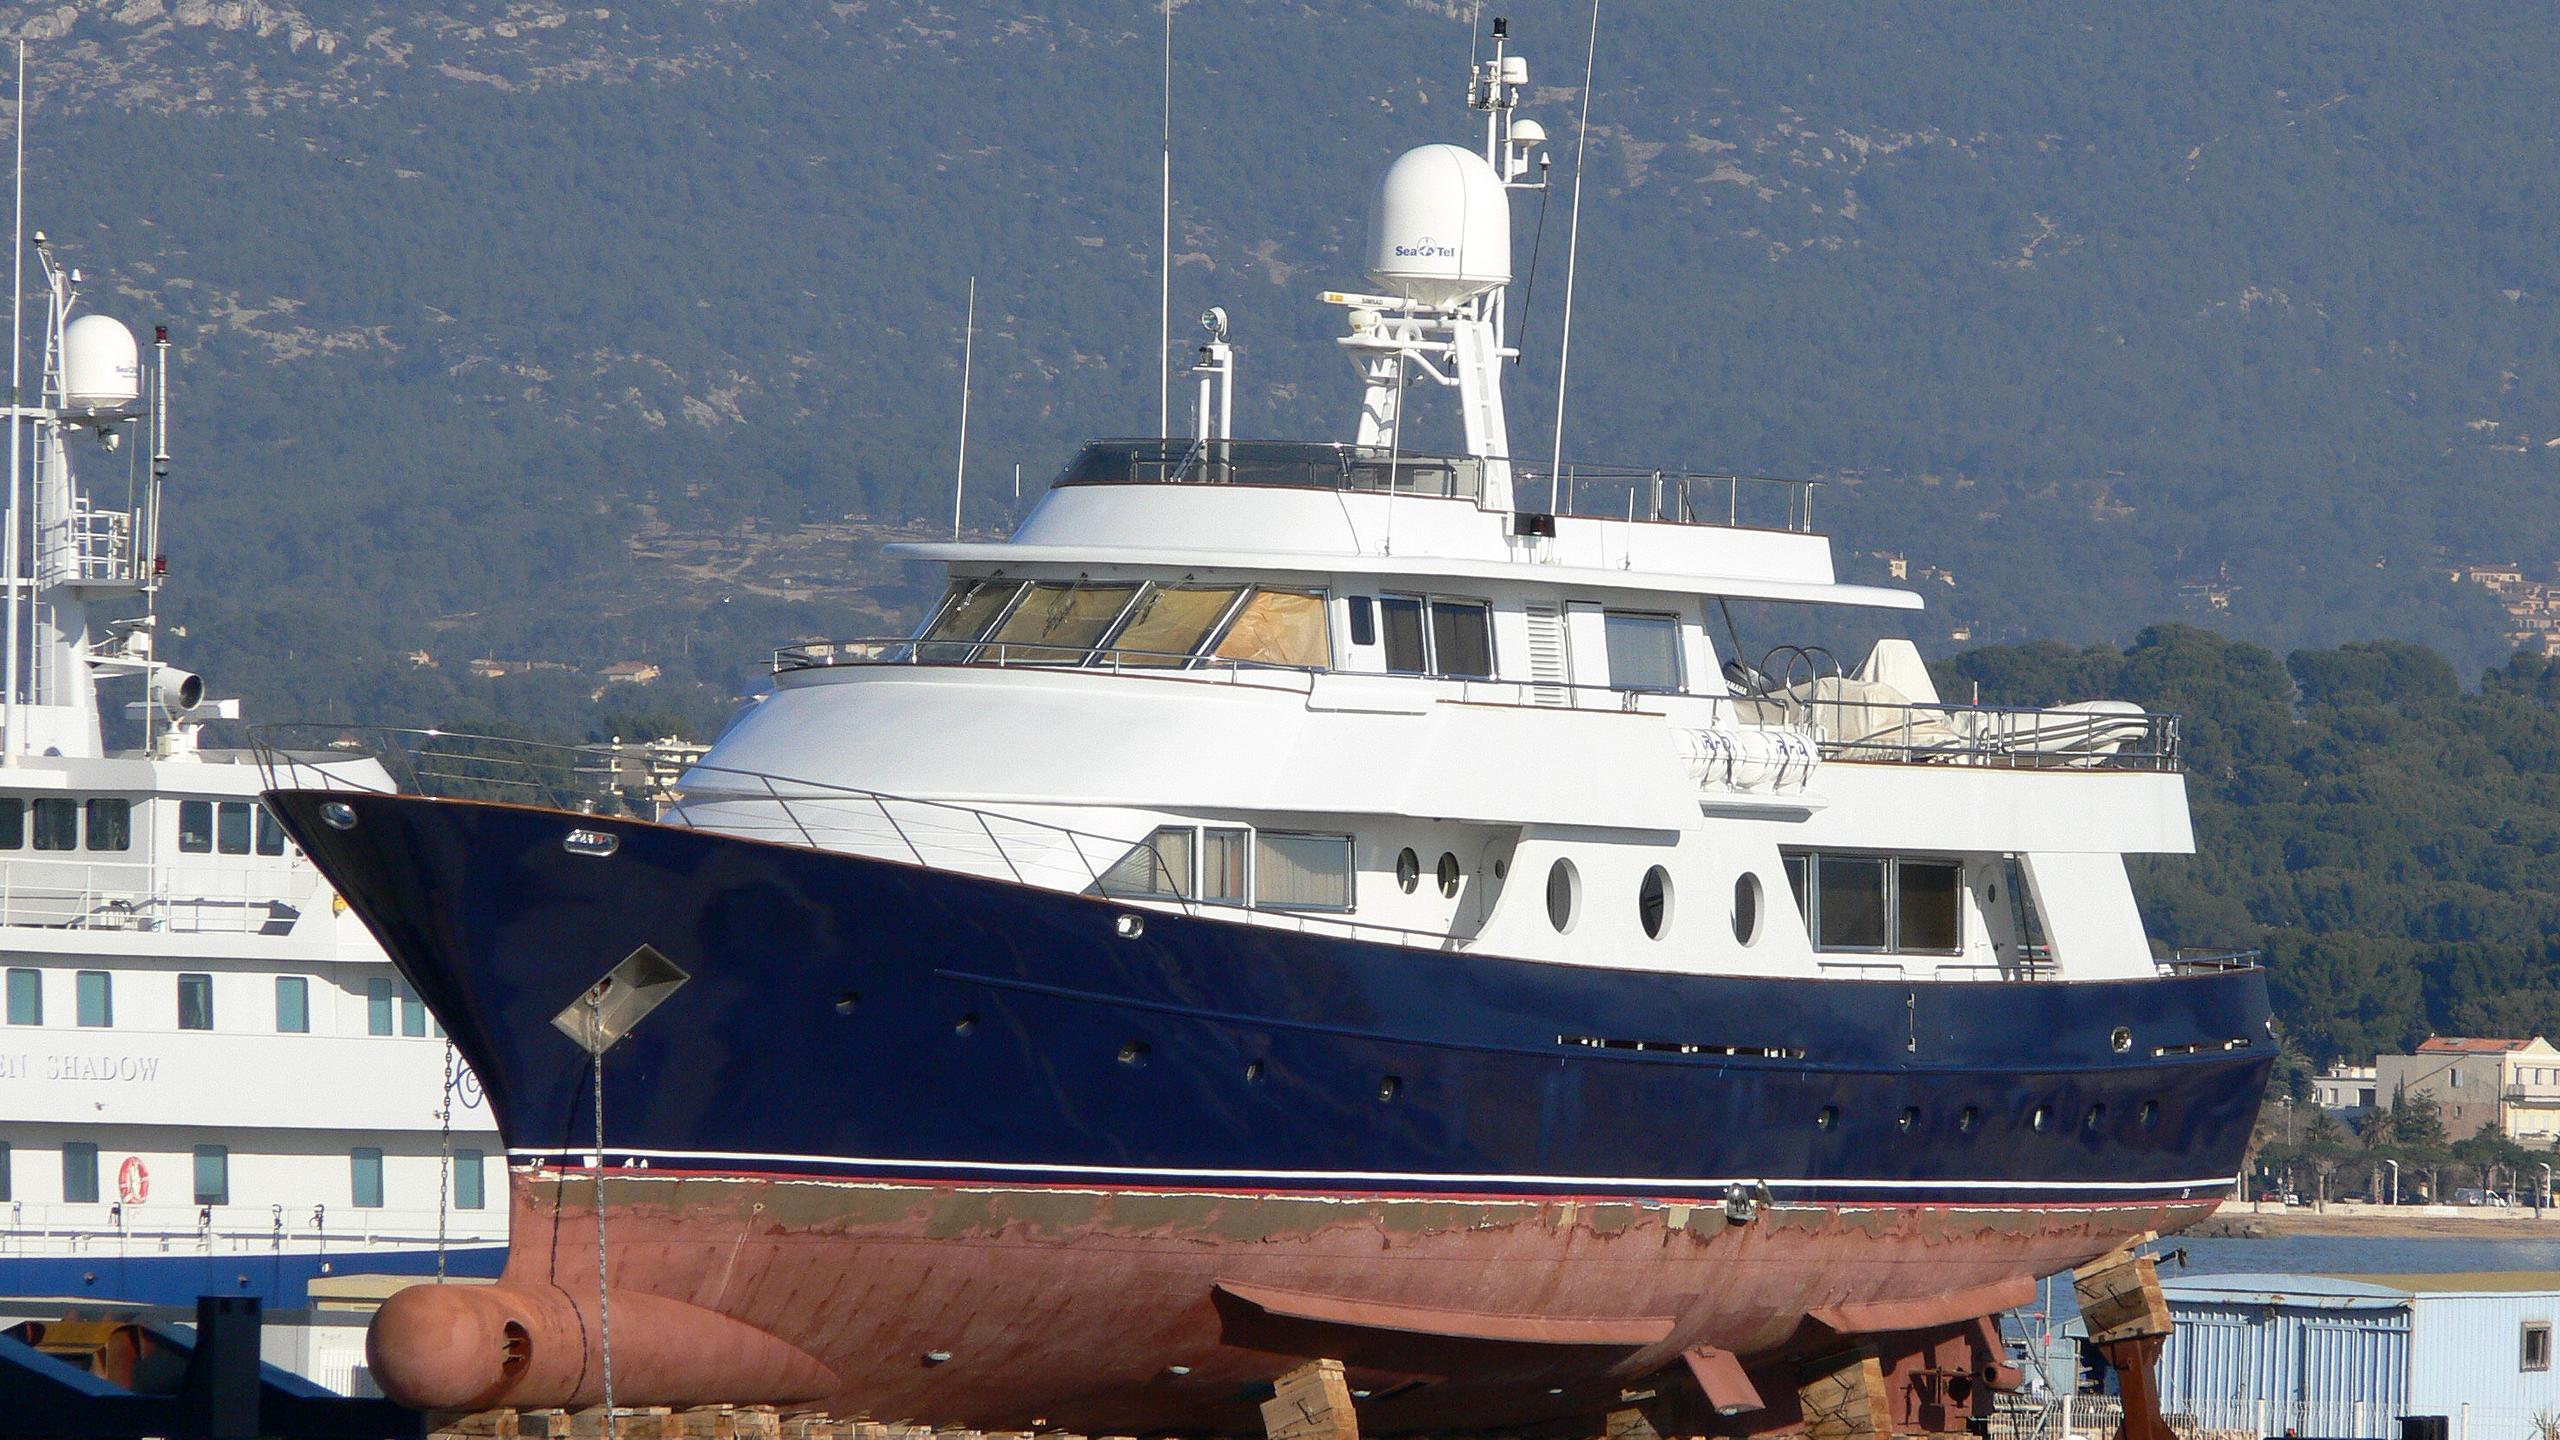 fayza-motor-yacht-nuevo-vulcano-1980-37m-dock